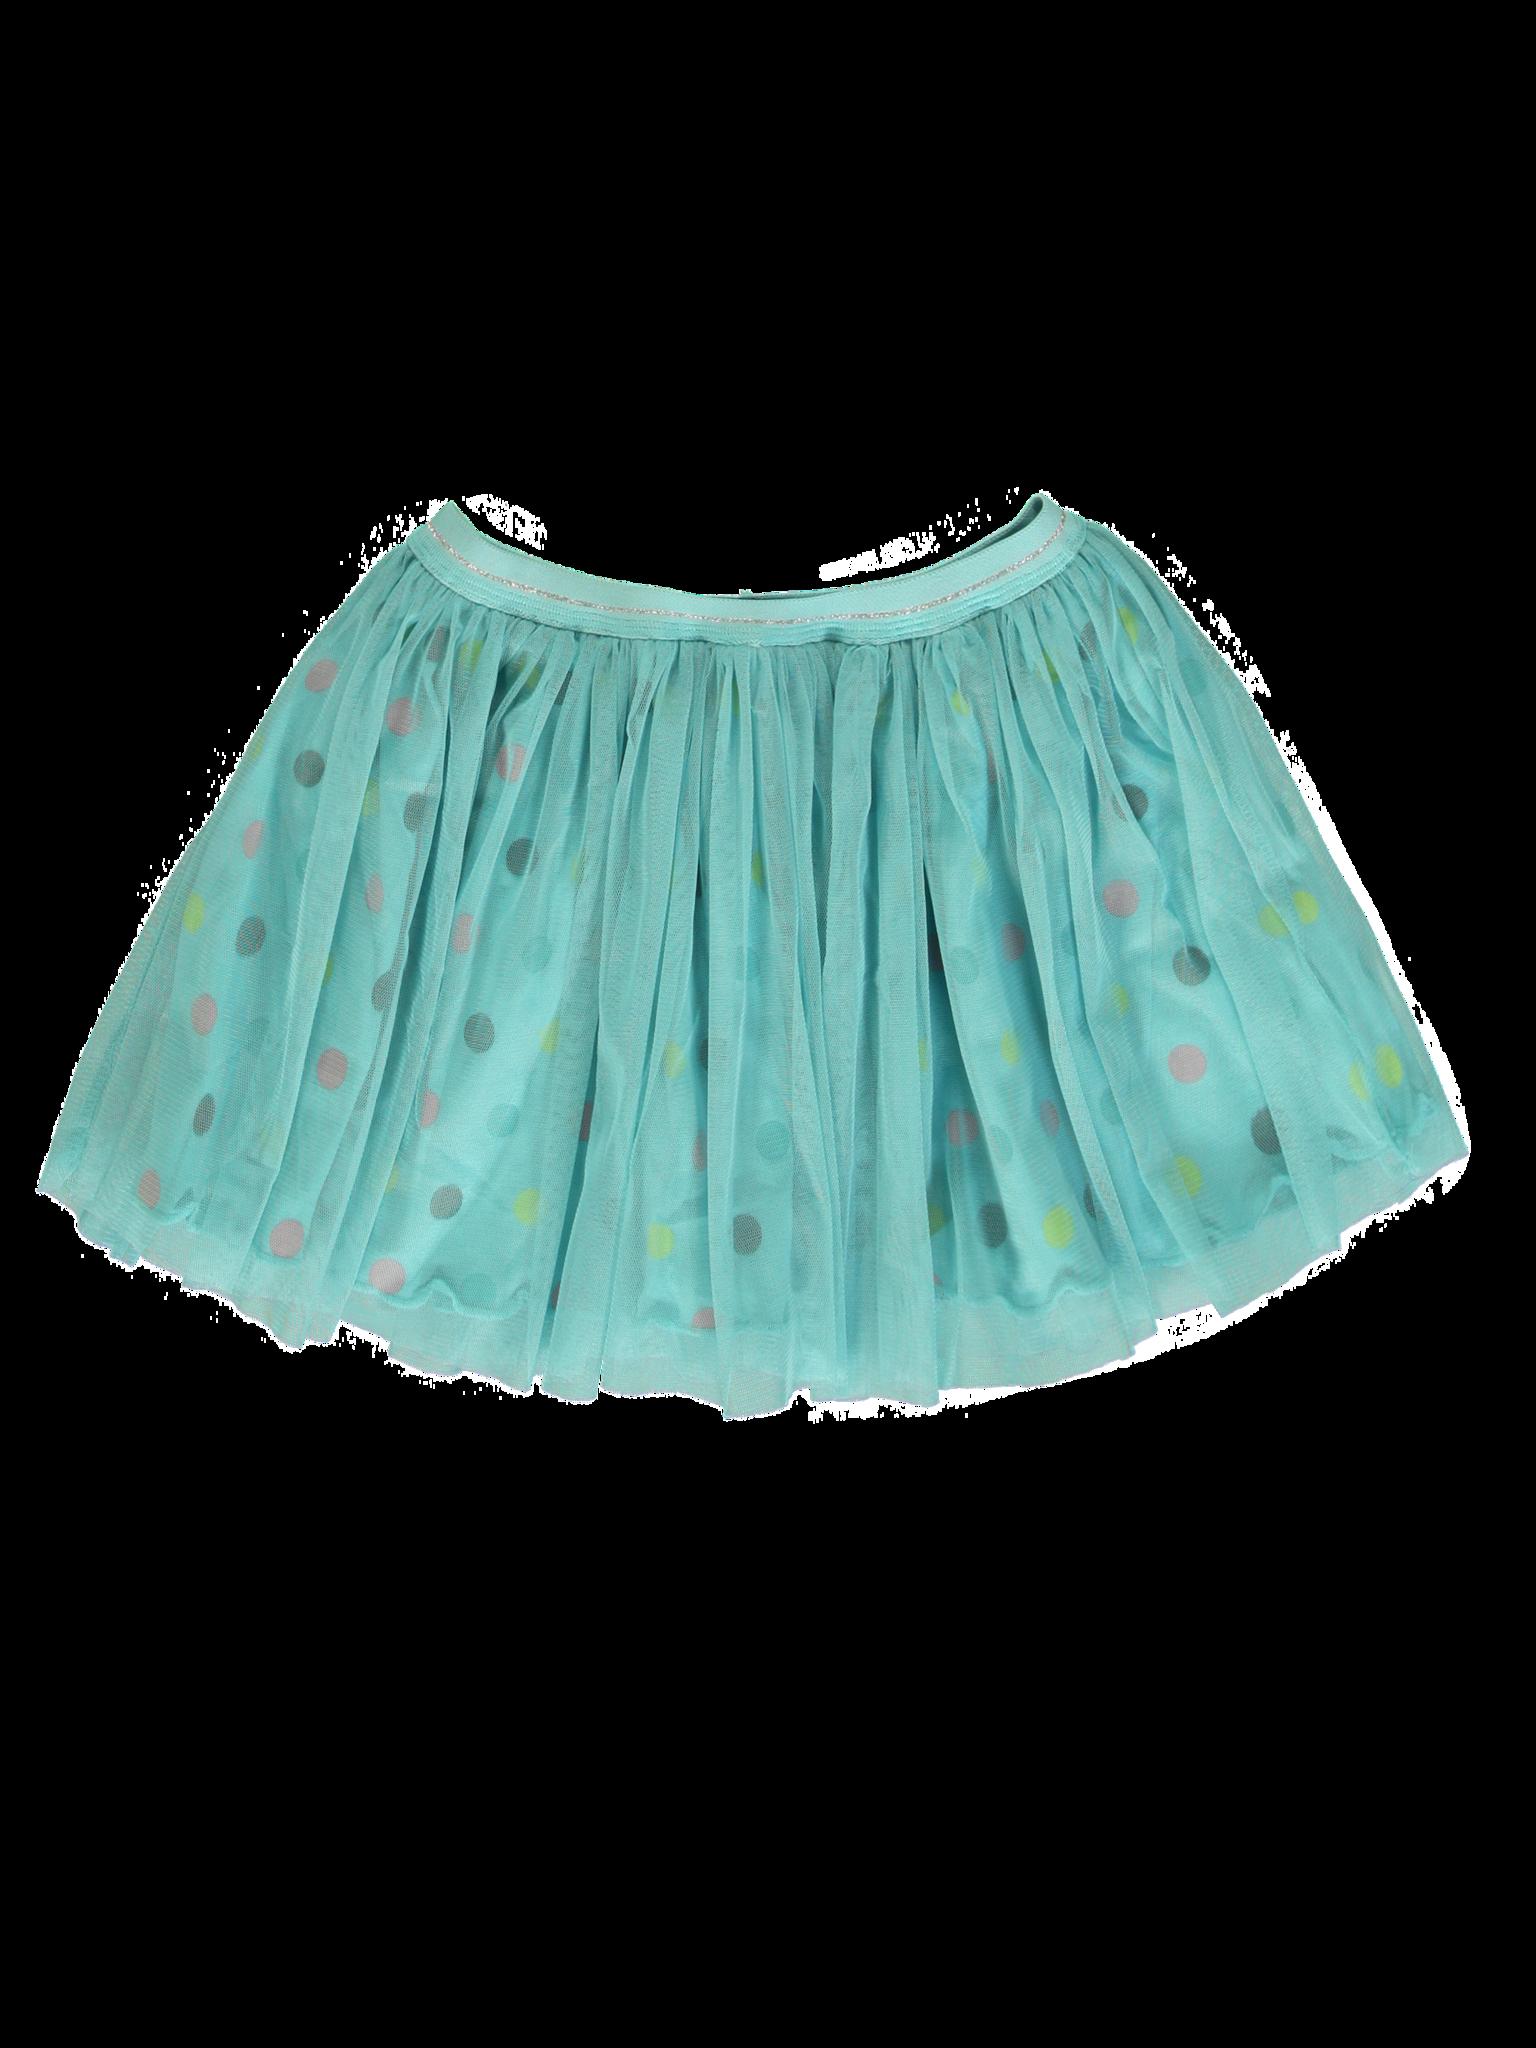 All Brands | Winterproducts Small Girls | Skirt | 10 pcs/box